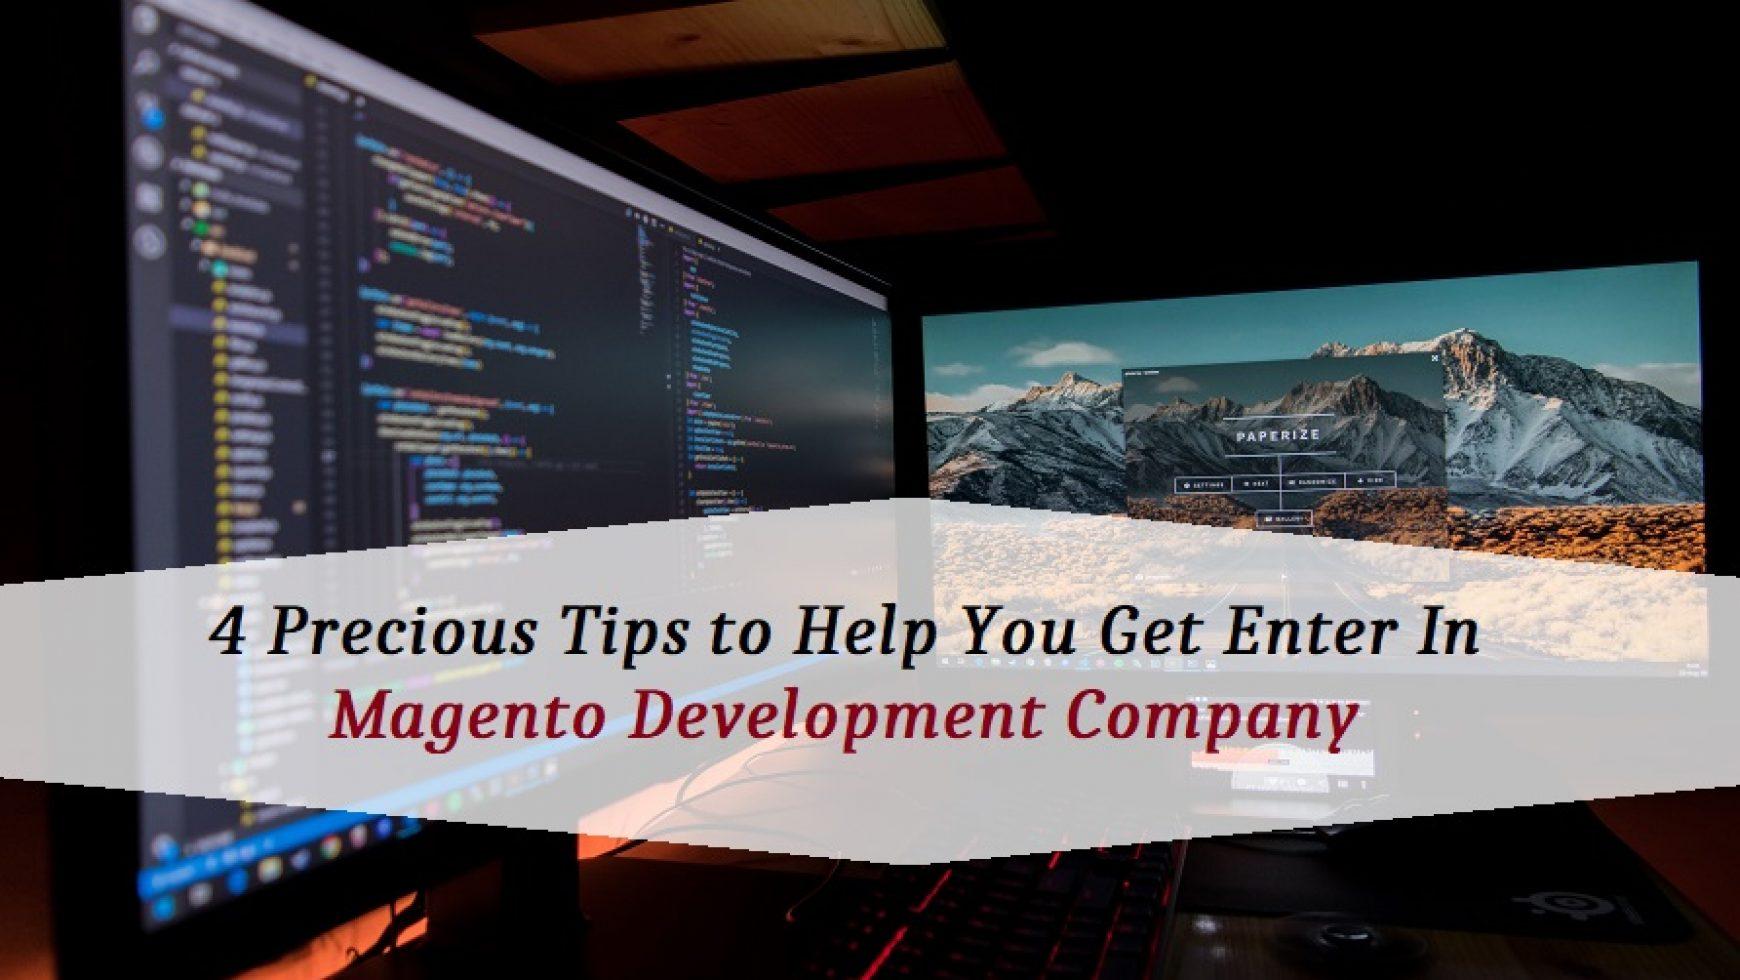 4 Precious Tips to Help You Get Enter In Magento Development Company